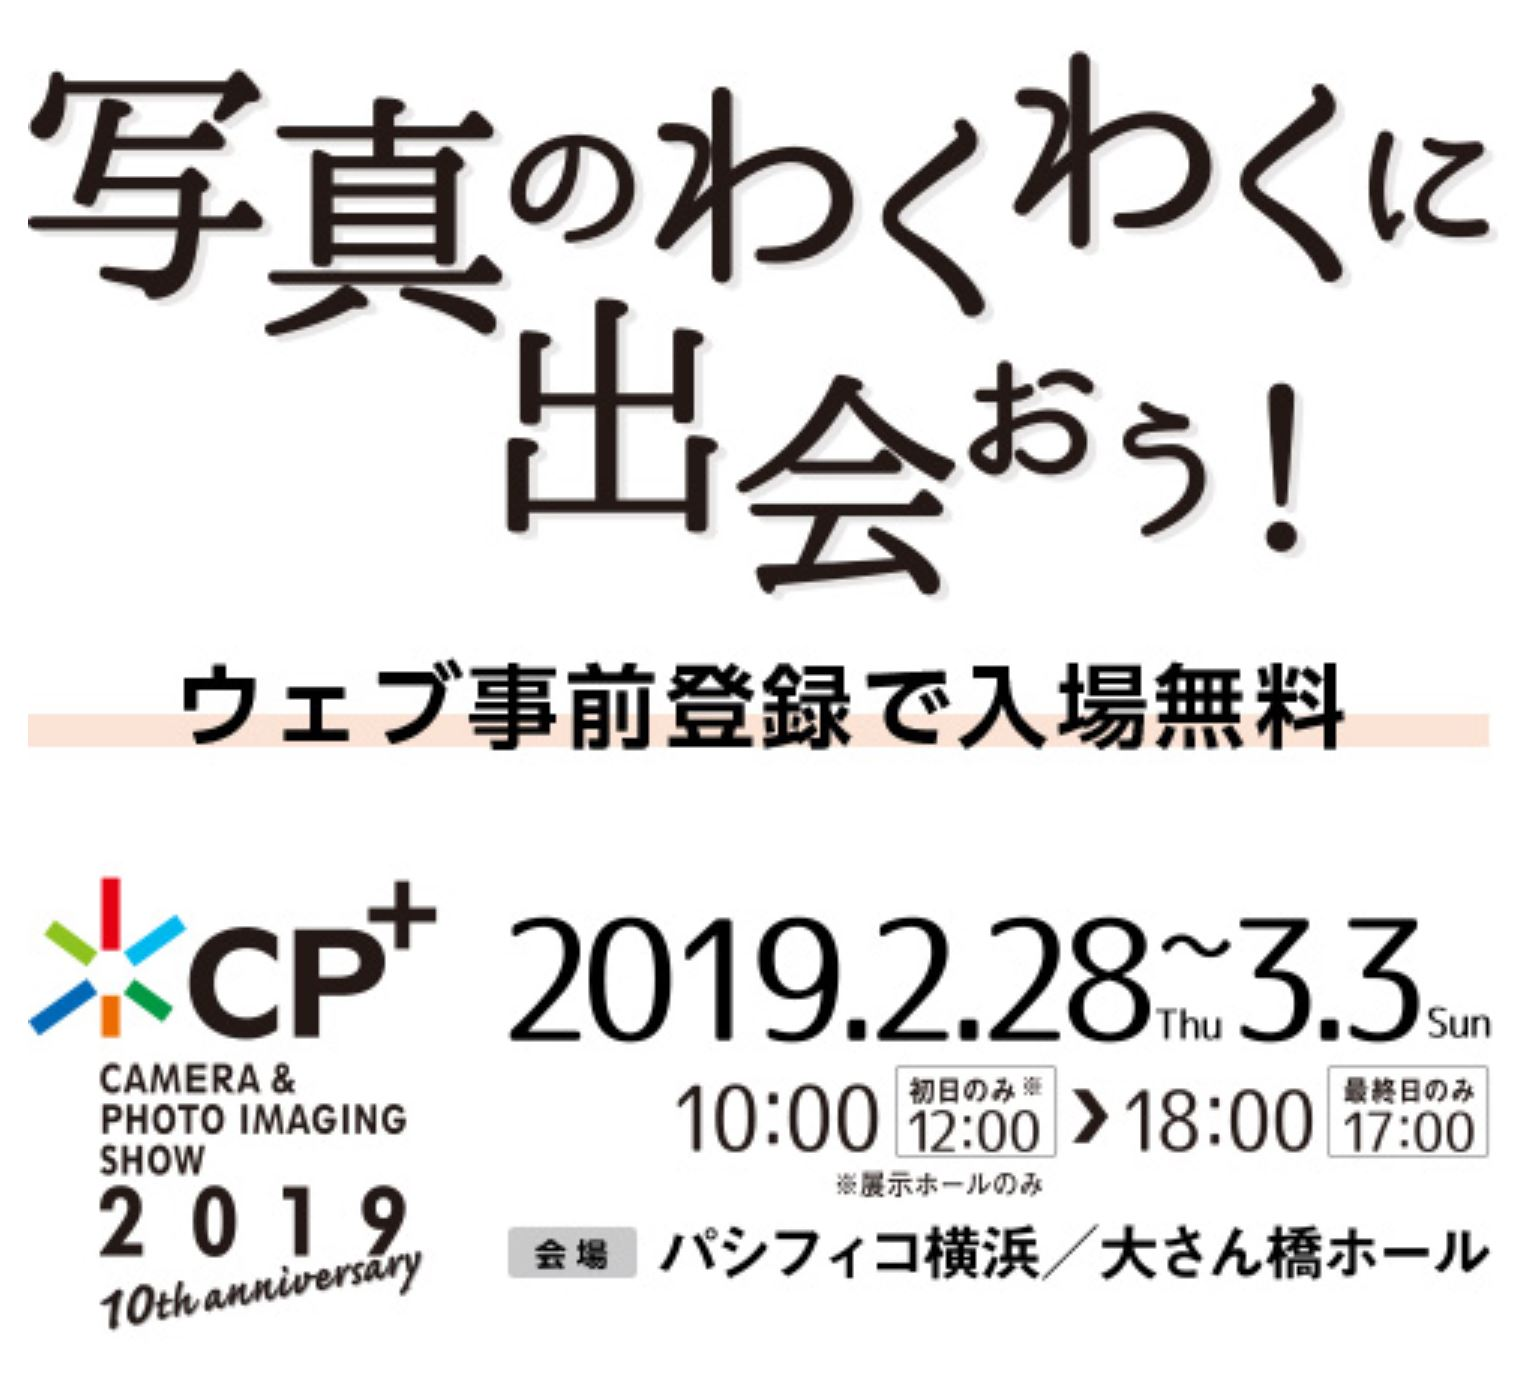 CP+2019,事前登録始まったよ!